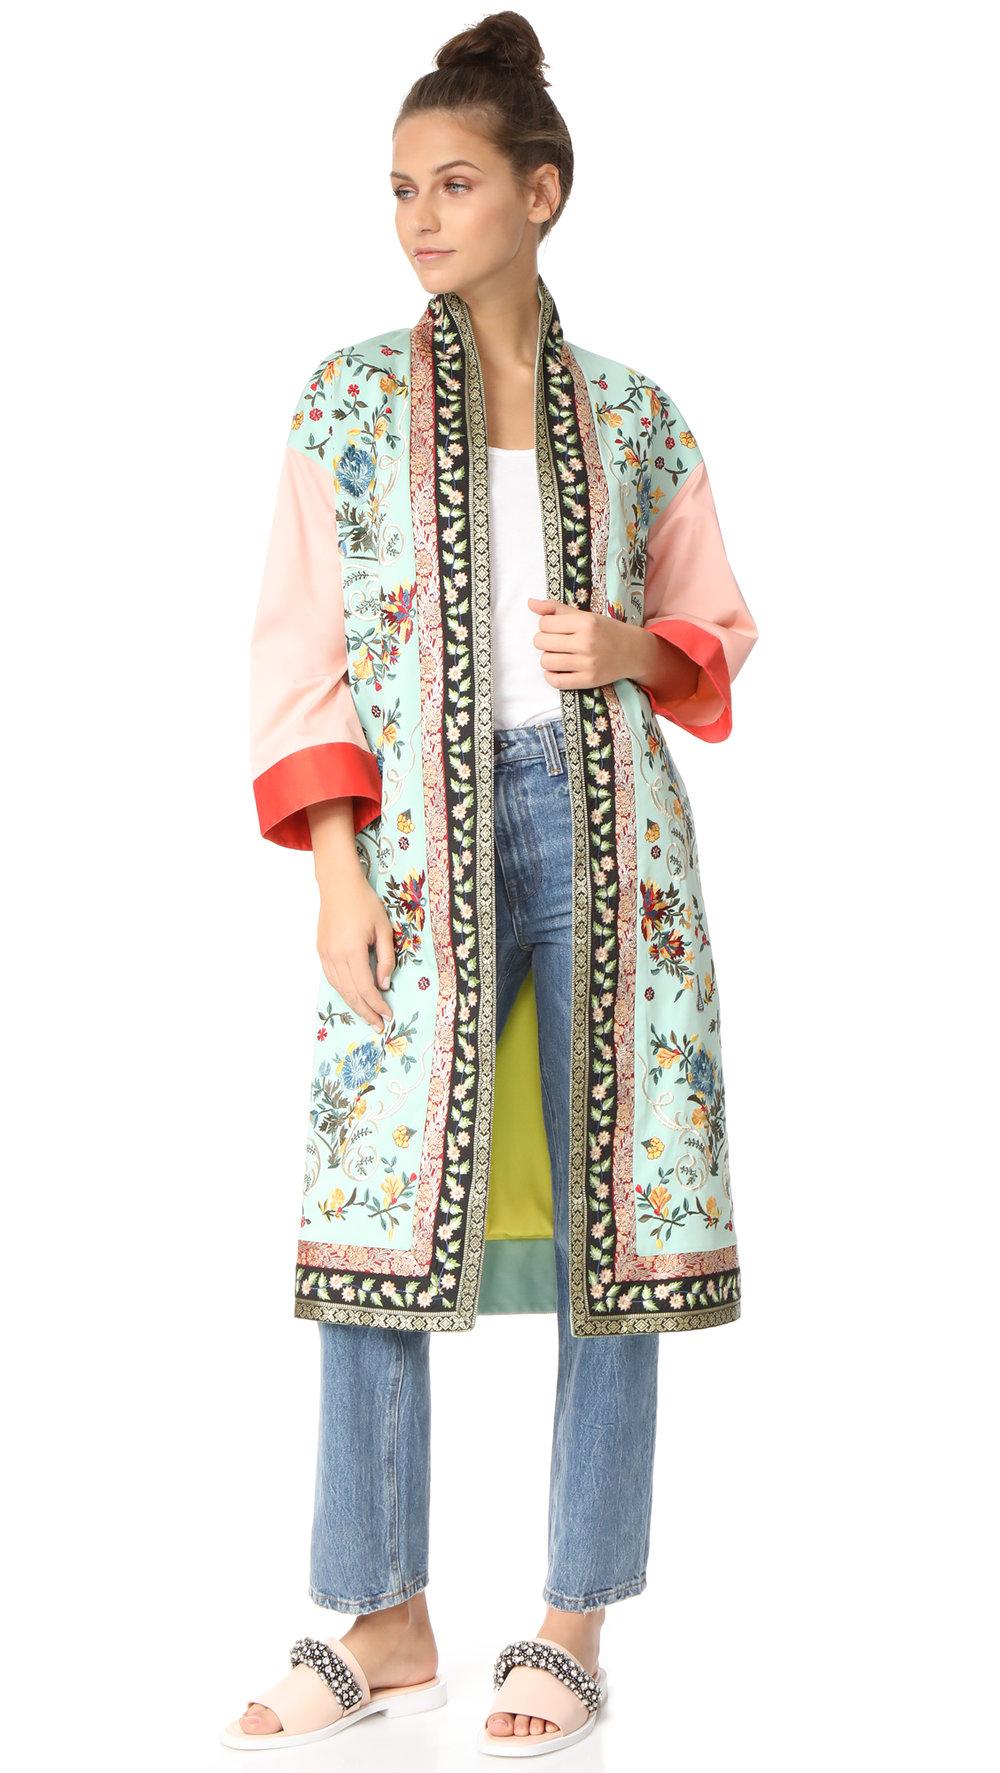 alice + olivia kimono coat